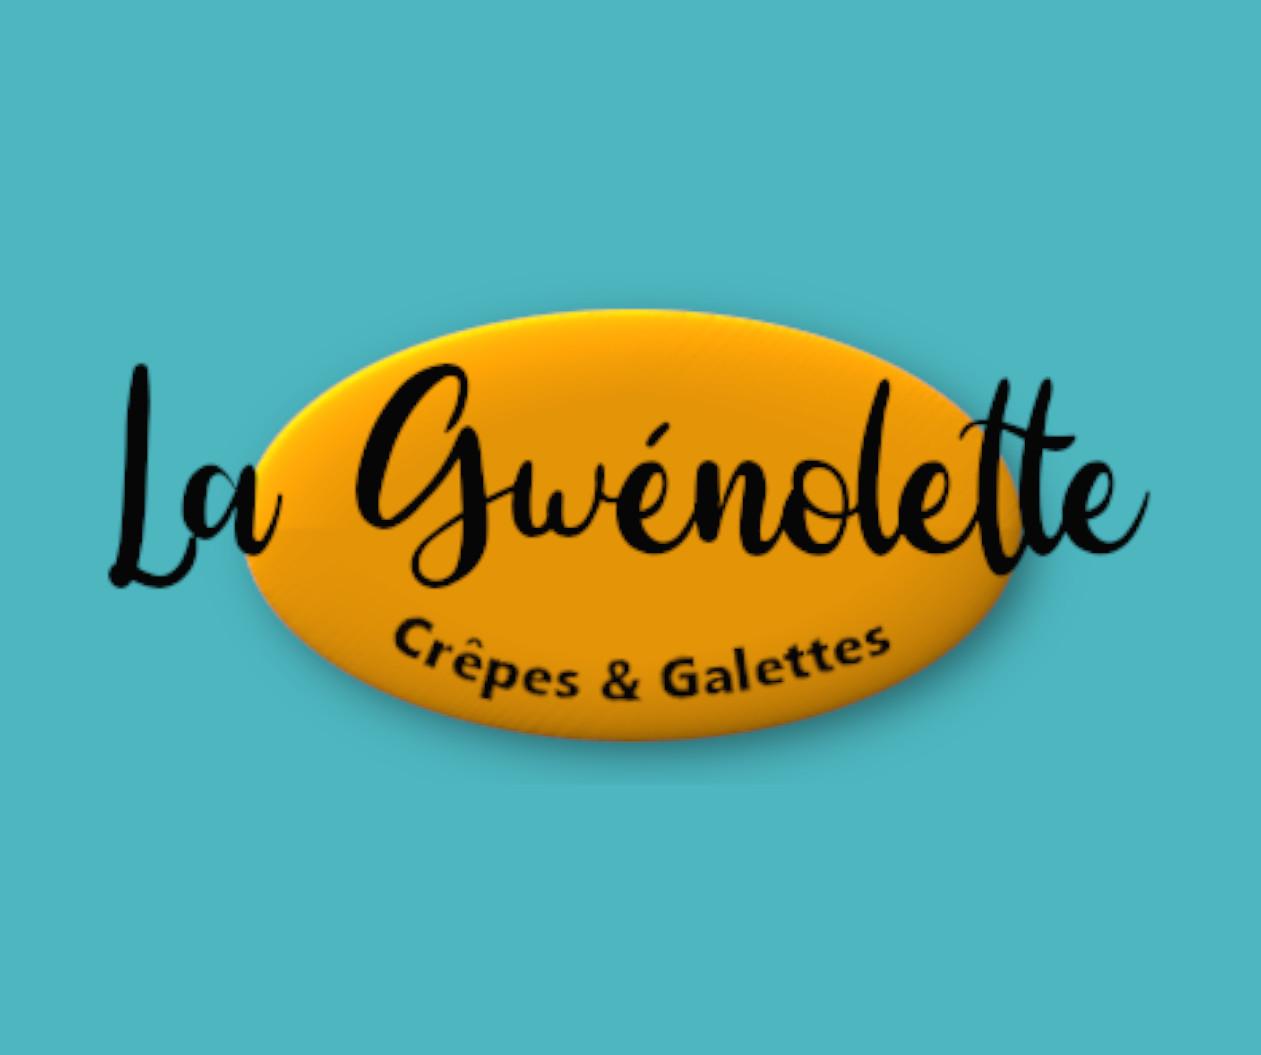 Gwenolette marché.jpg